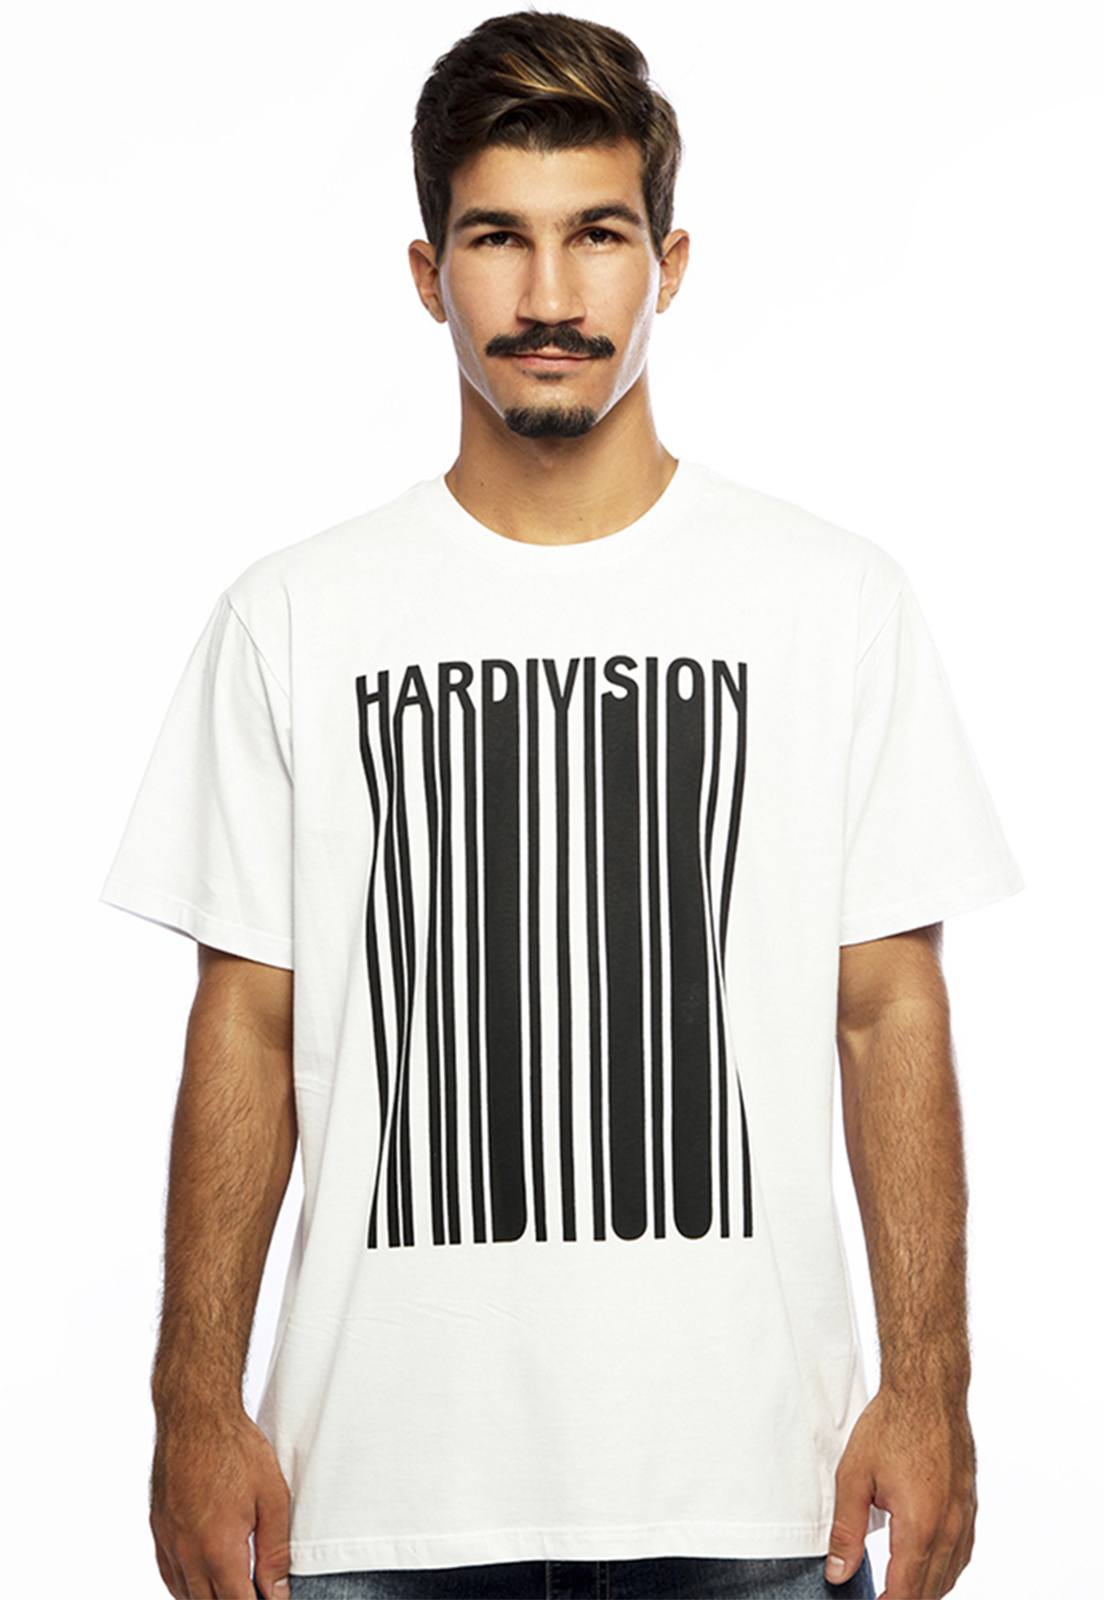 Camiseta Hardivision New Order Manga Curta Branco